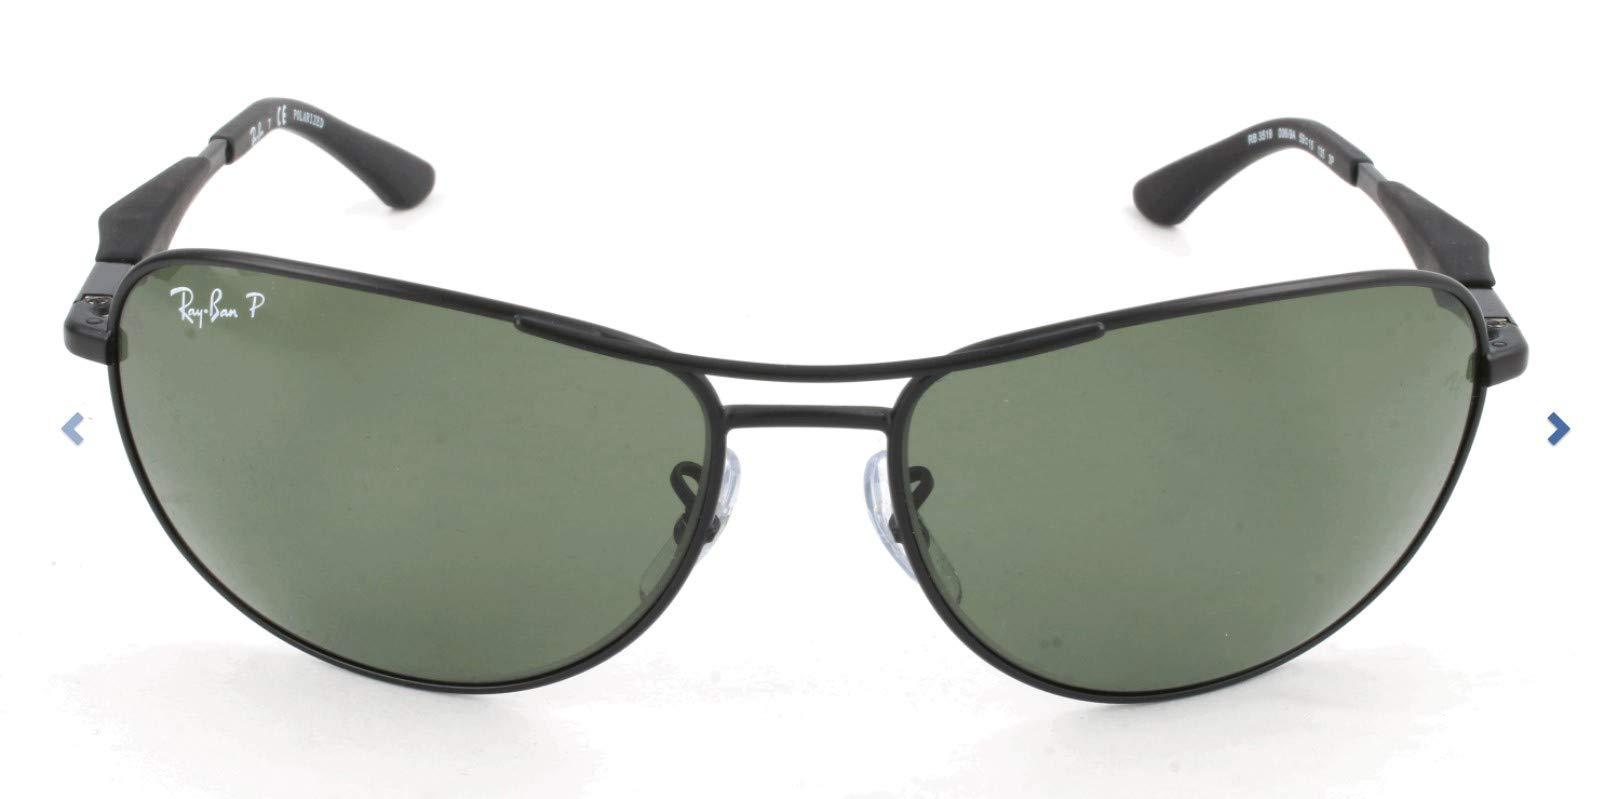 Ray-Ban RB3519 Aviator Sunglasses, Matte Black/Polarized Green, 59 mm